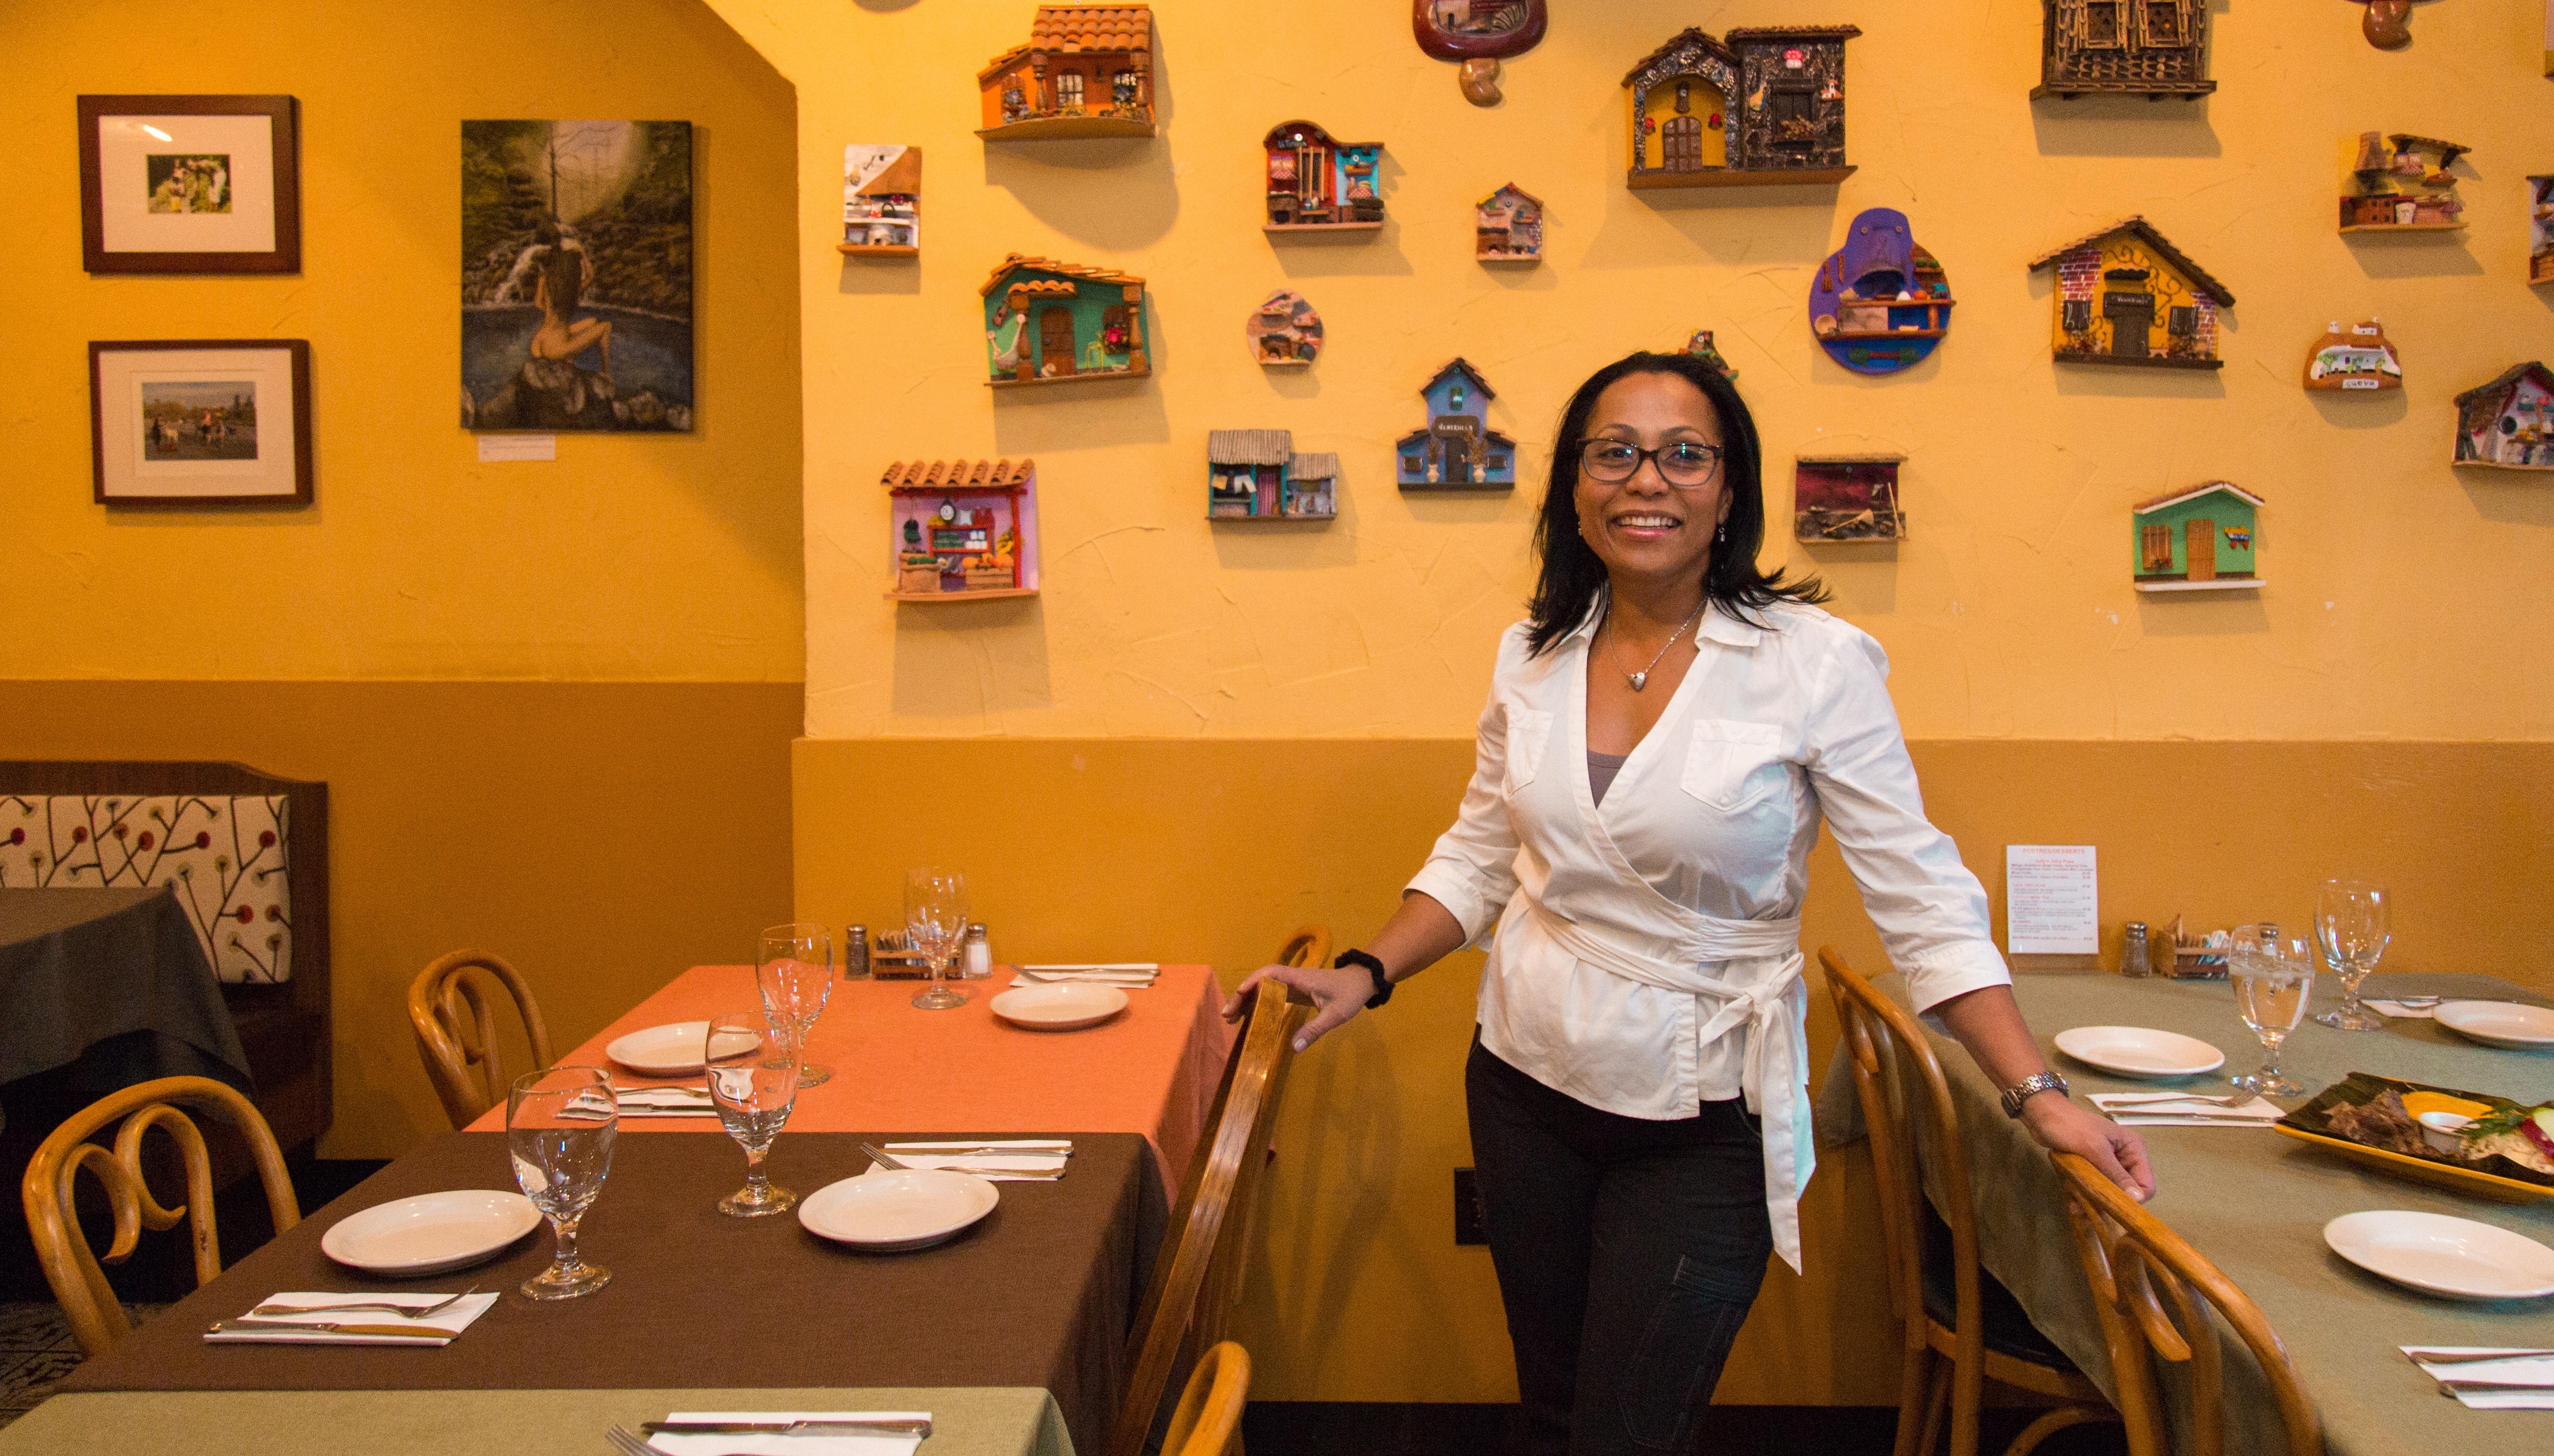 Chef Judith Suzarra-Campbellat Sazón Restaurant and Café. Photograph taken by Samantha Laub for AL DÍA News.